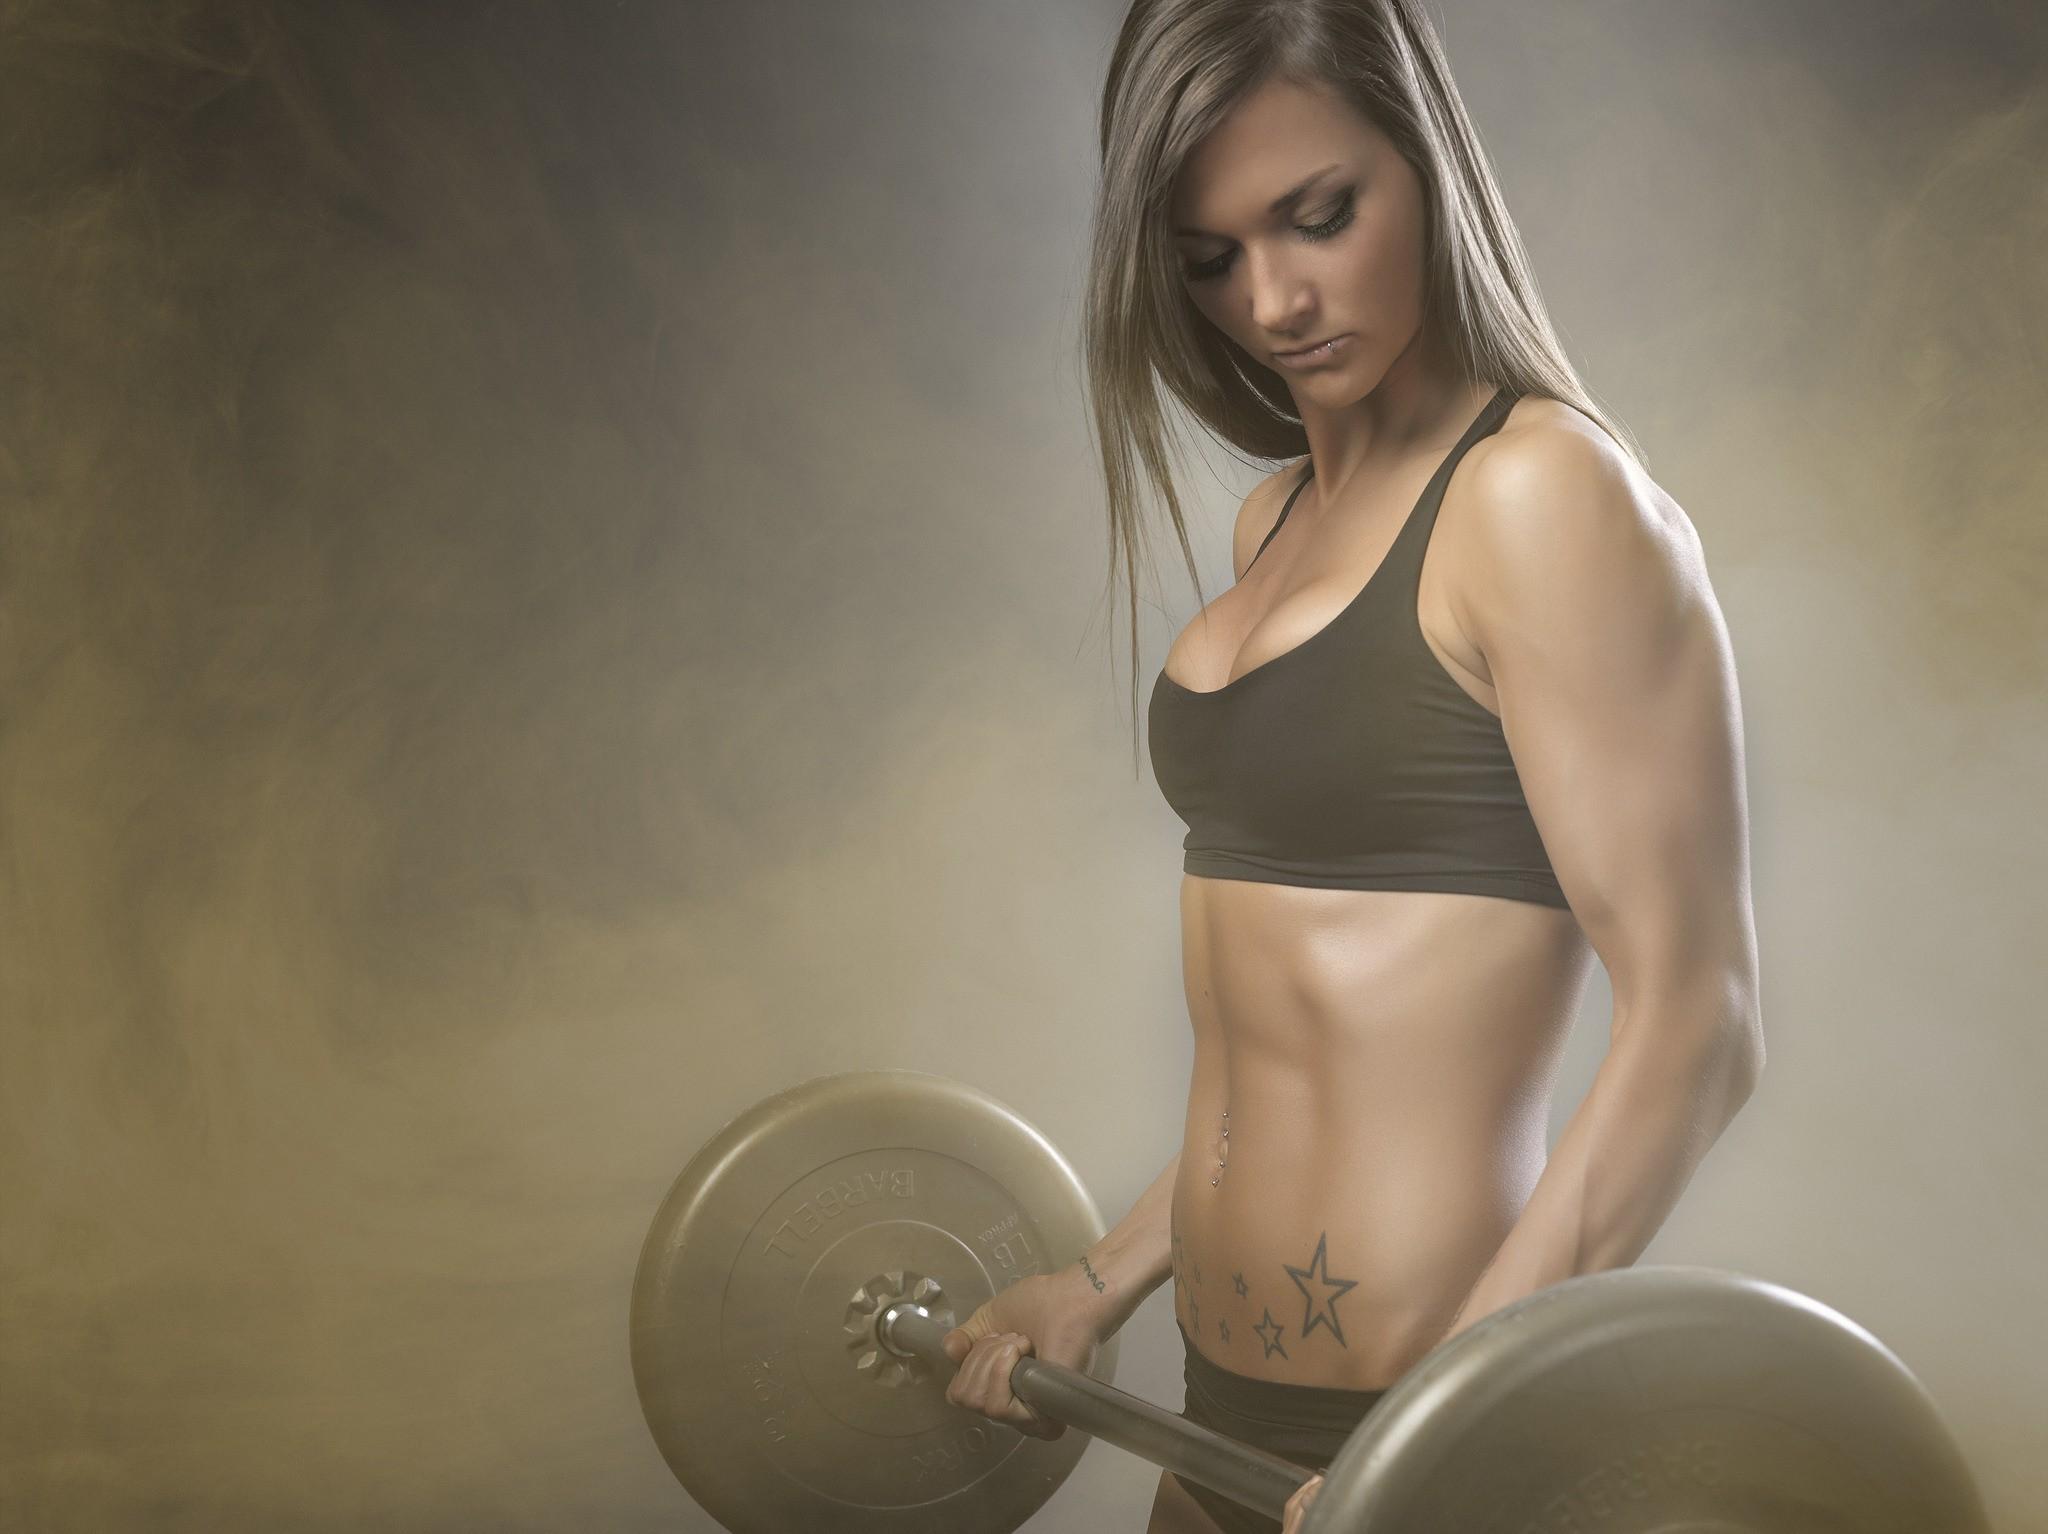 People 2048x1534 sports skinny bodybuilding tattoo fitness model women